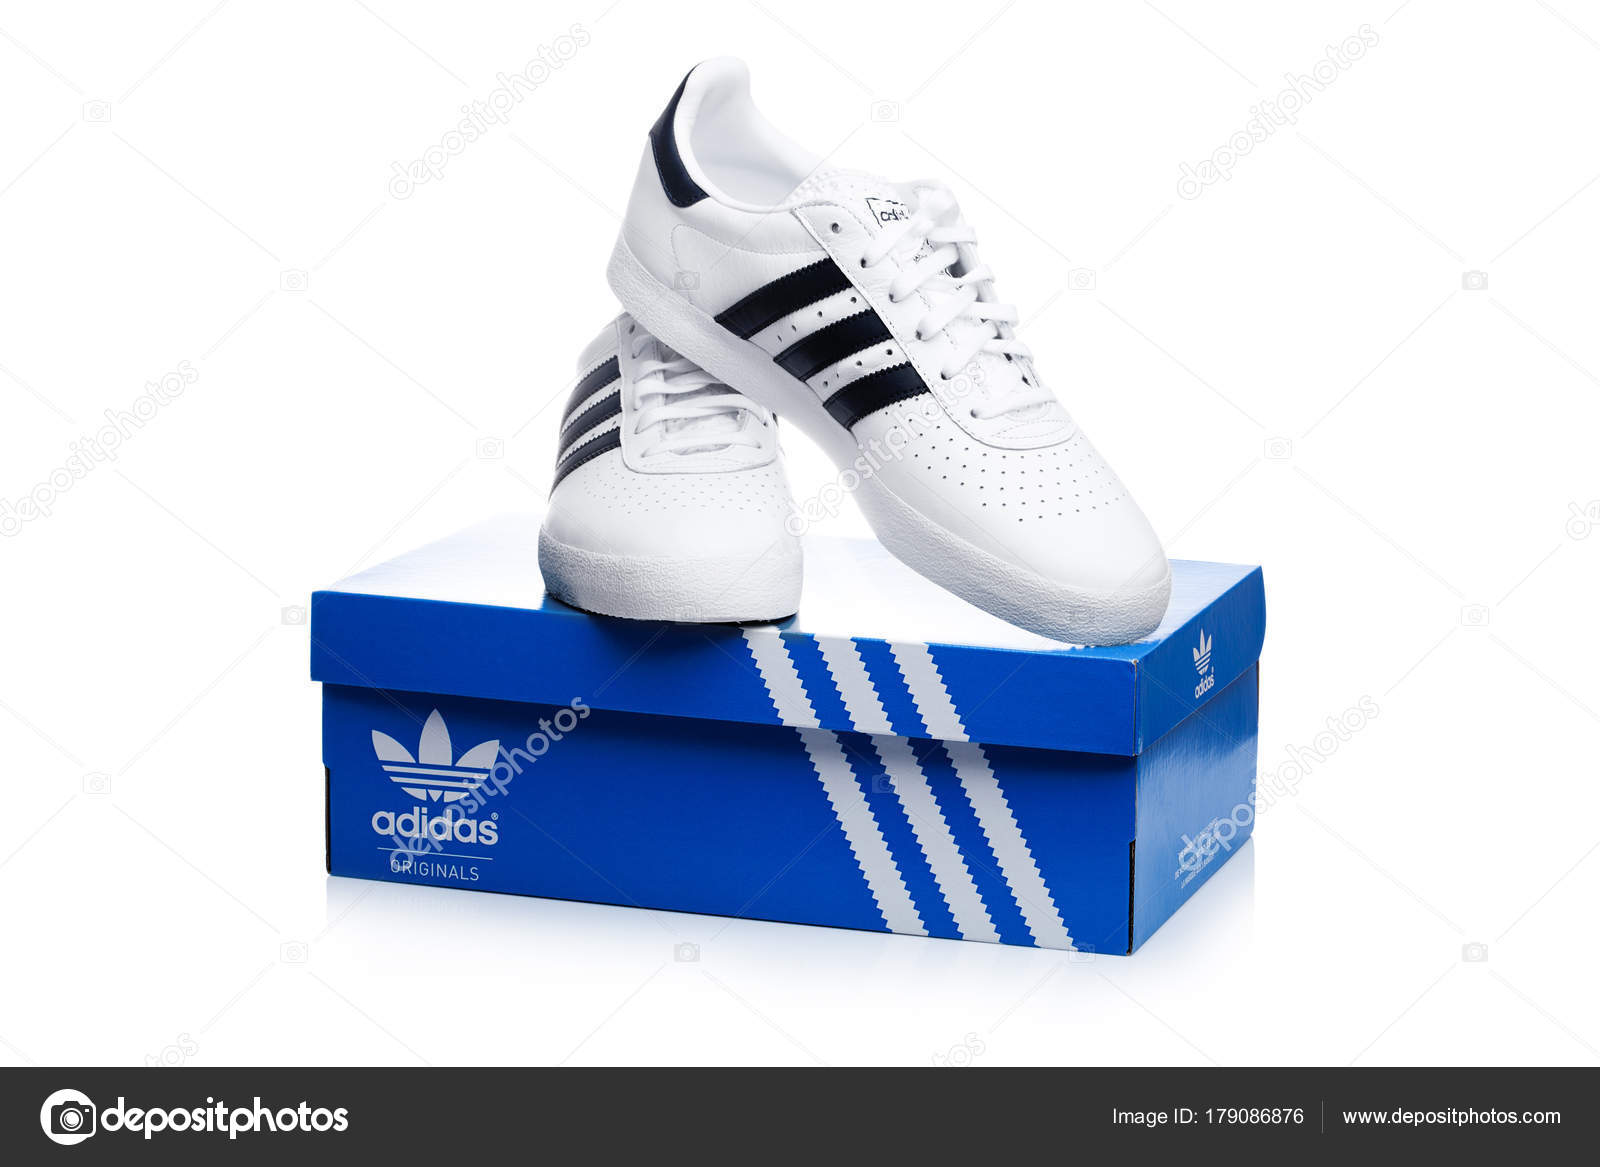 adidas london schoenen